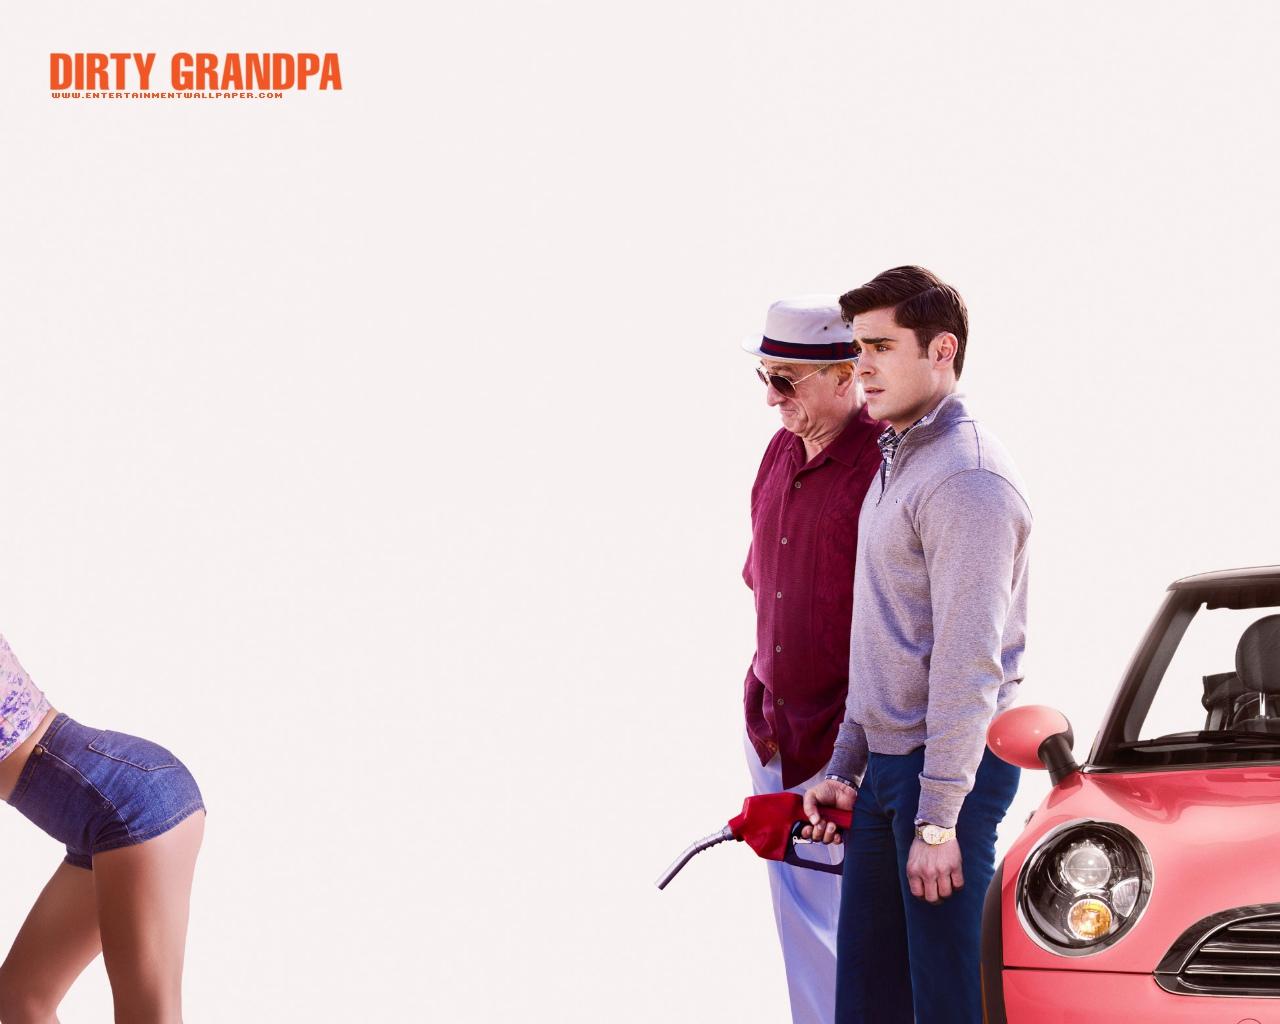 dirty-grandpa wallpaper